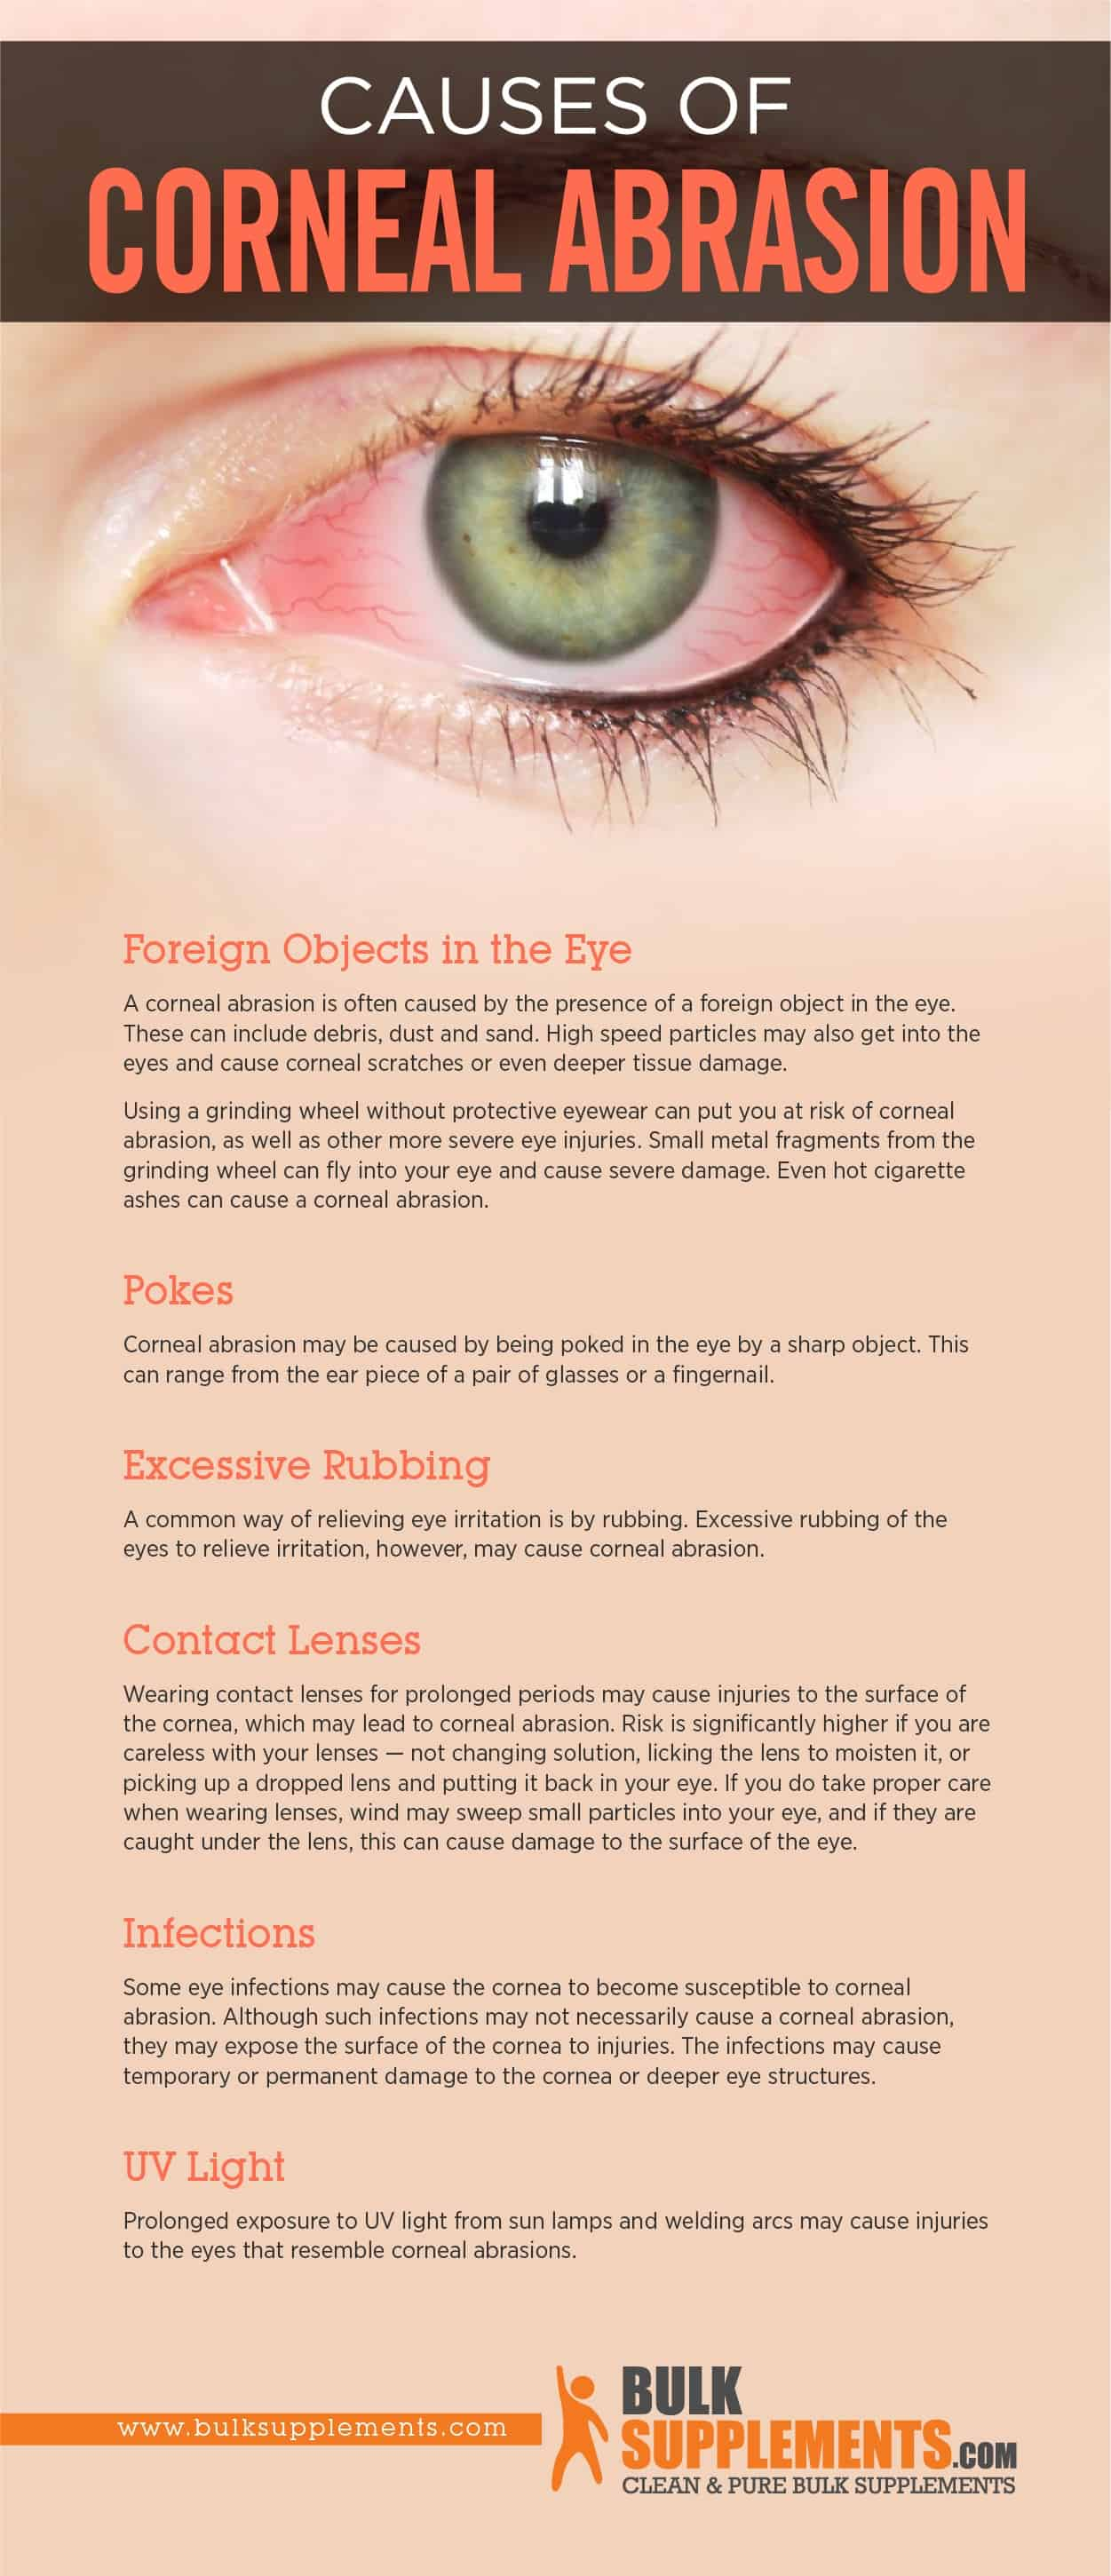 Causes of Corneal Abrasion